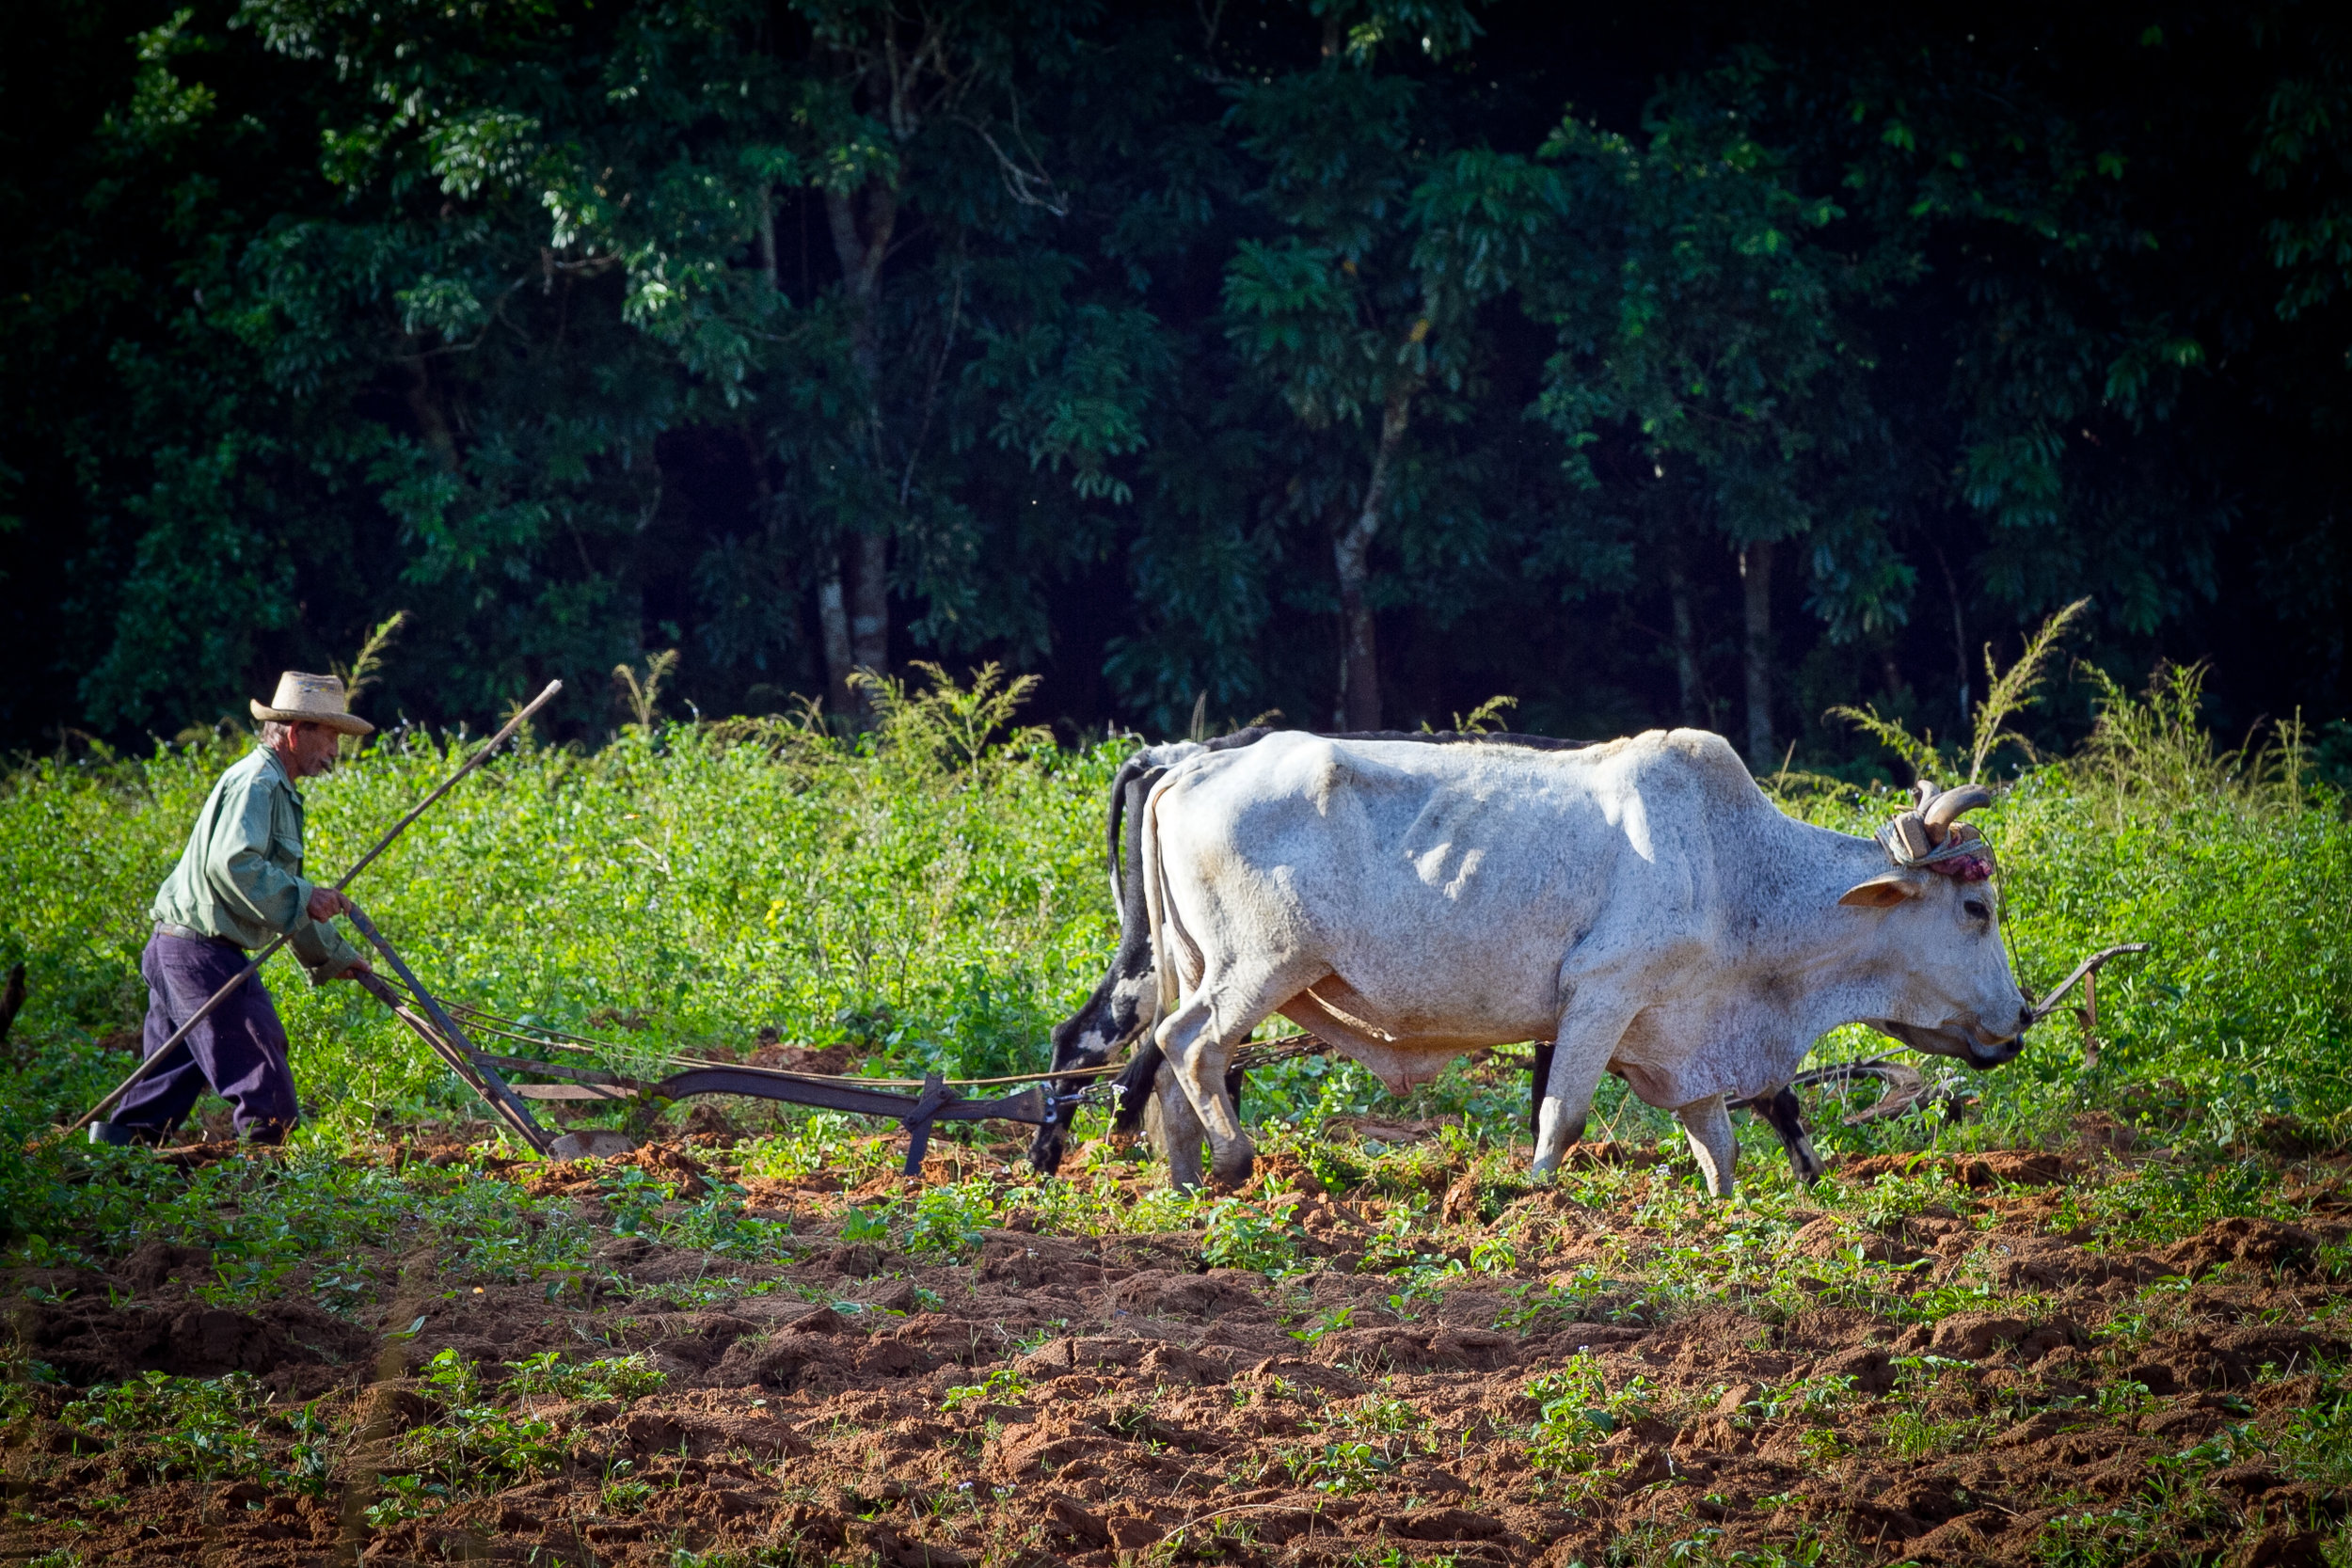 Farmer plowing his field, Vinales, Cuba